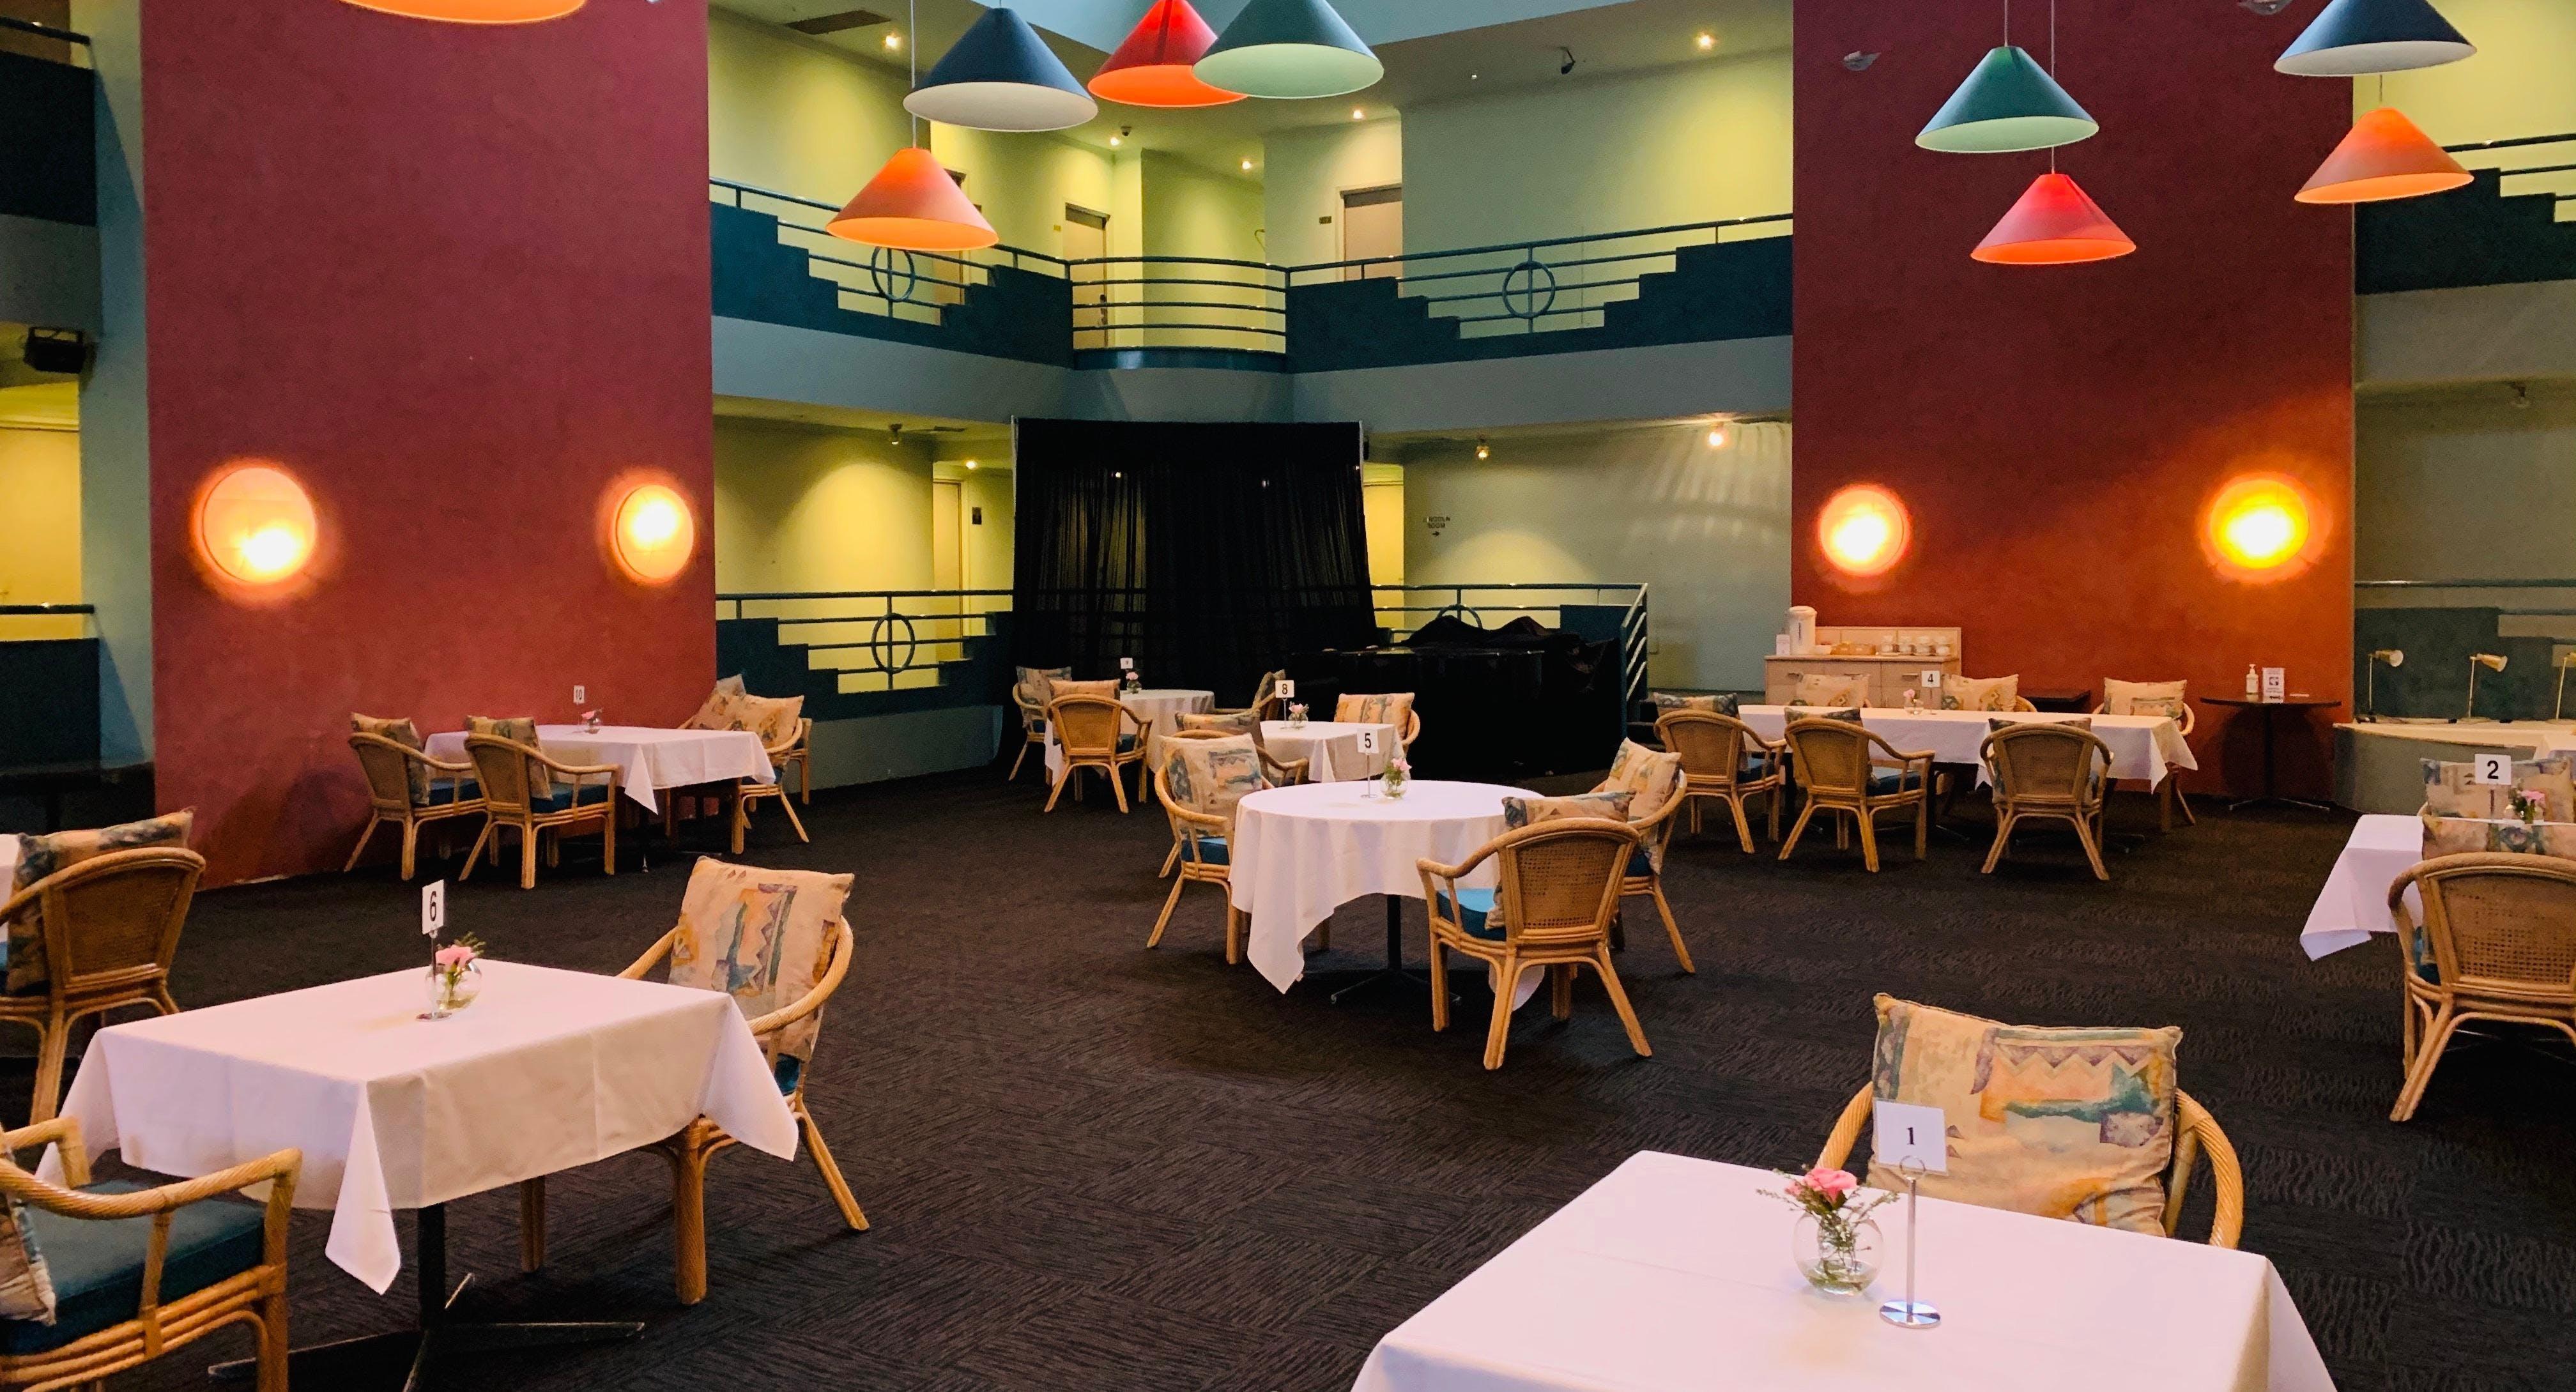 Natalie's Restaurant & Bar